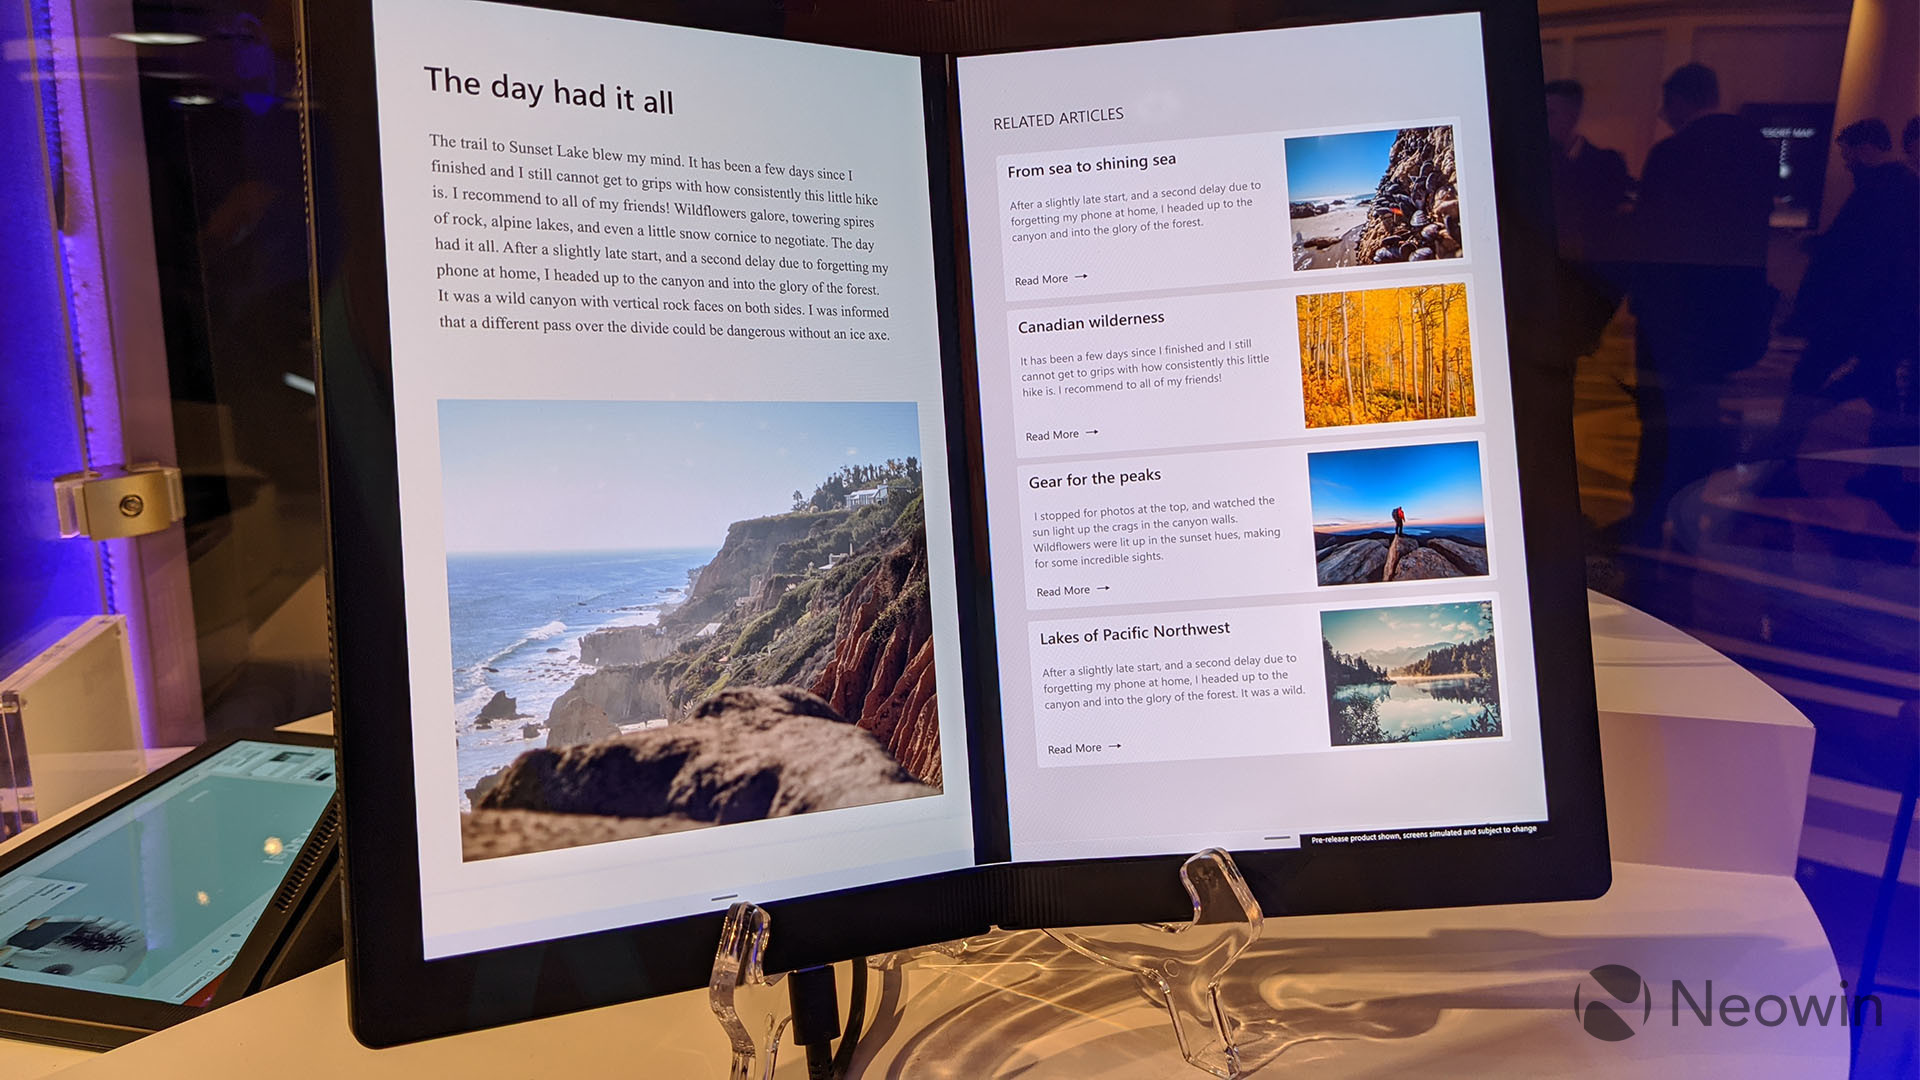 First look at the Lenovo ThinkPad X1 Fold running Windows 10X 5